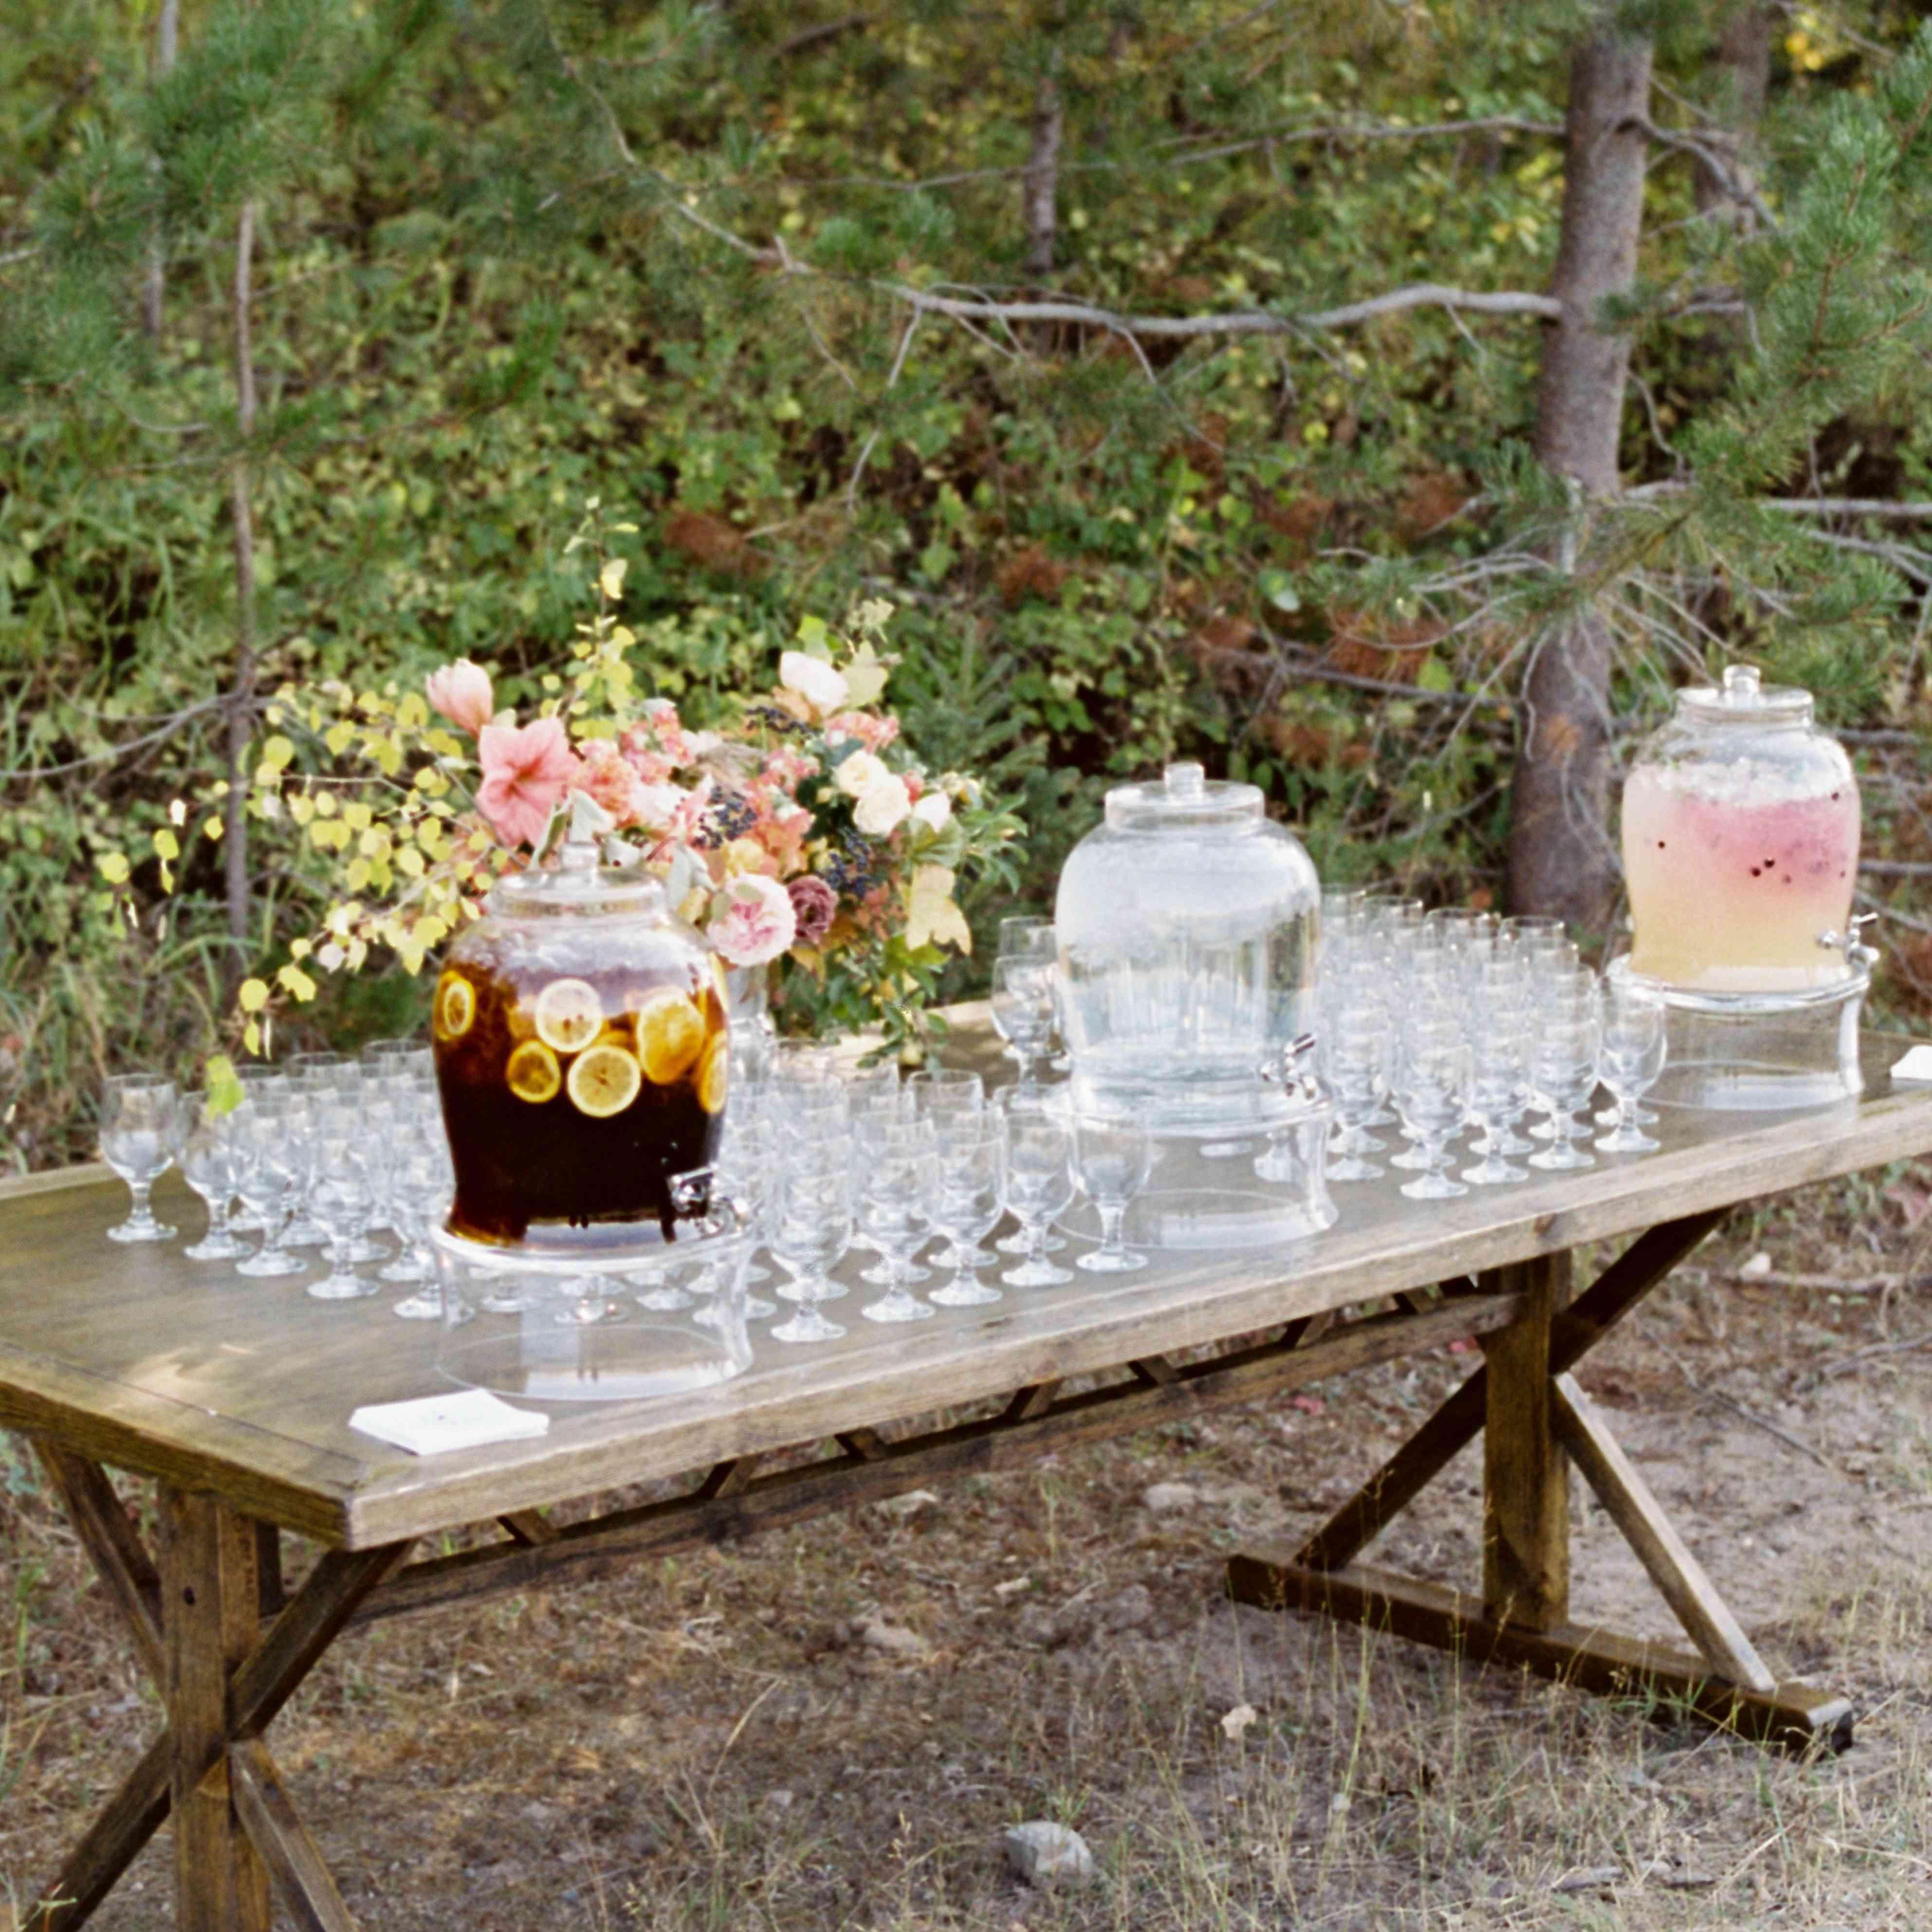 lemonade and ice tea station